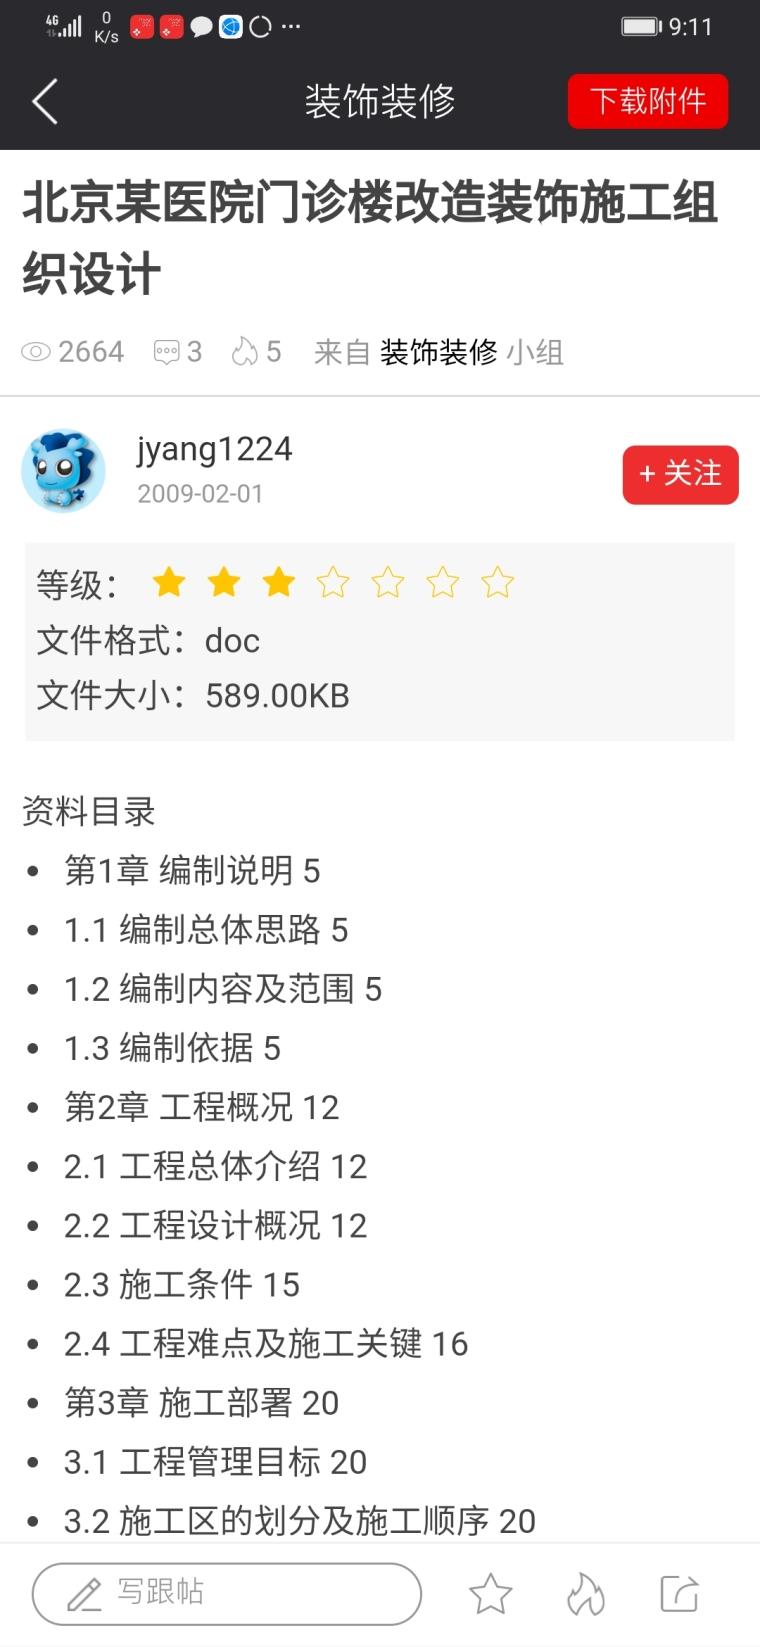 #筑龙教育意见反馈#版本2.5.1,VOG-AL10,android:10_1